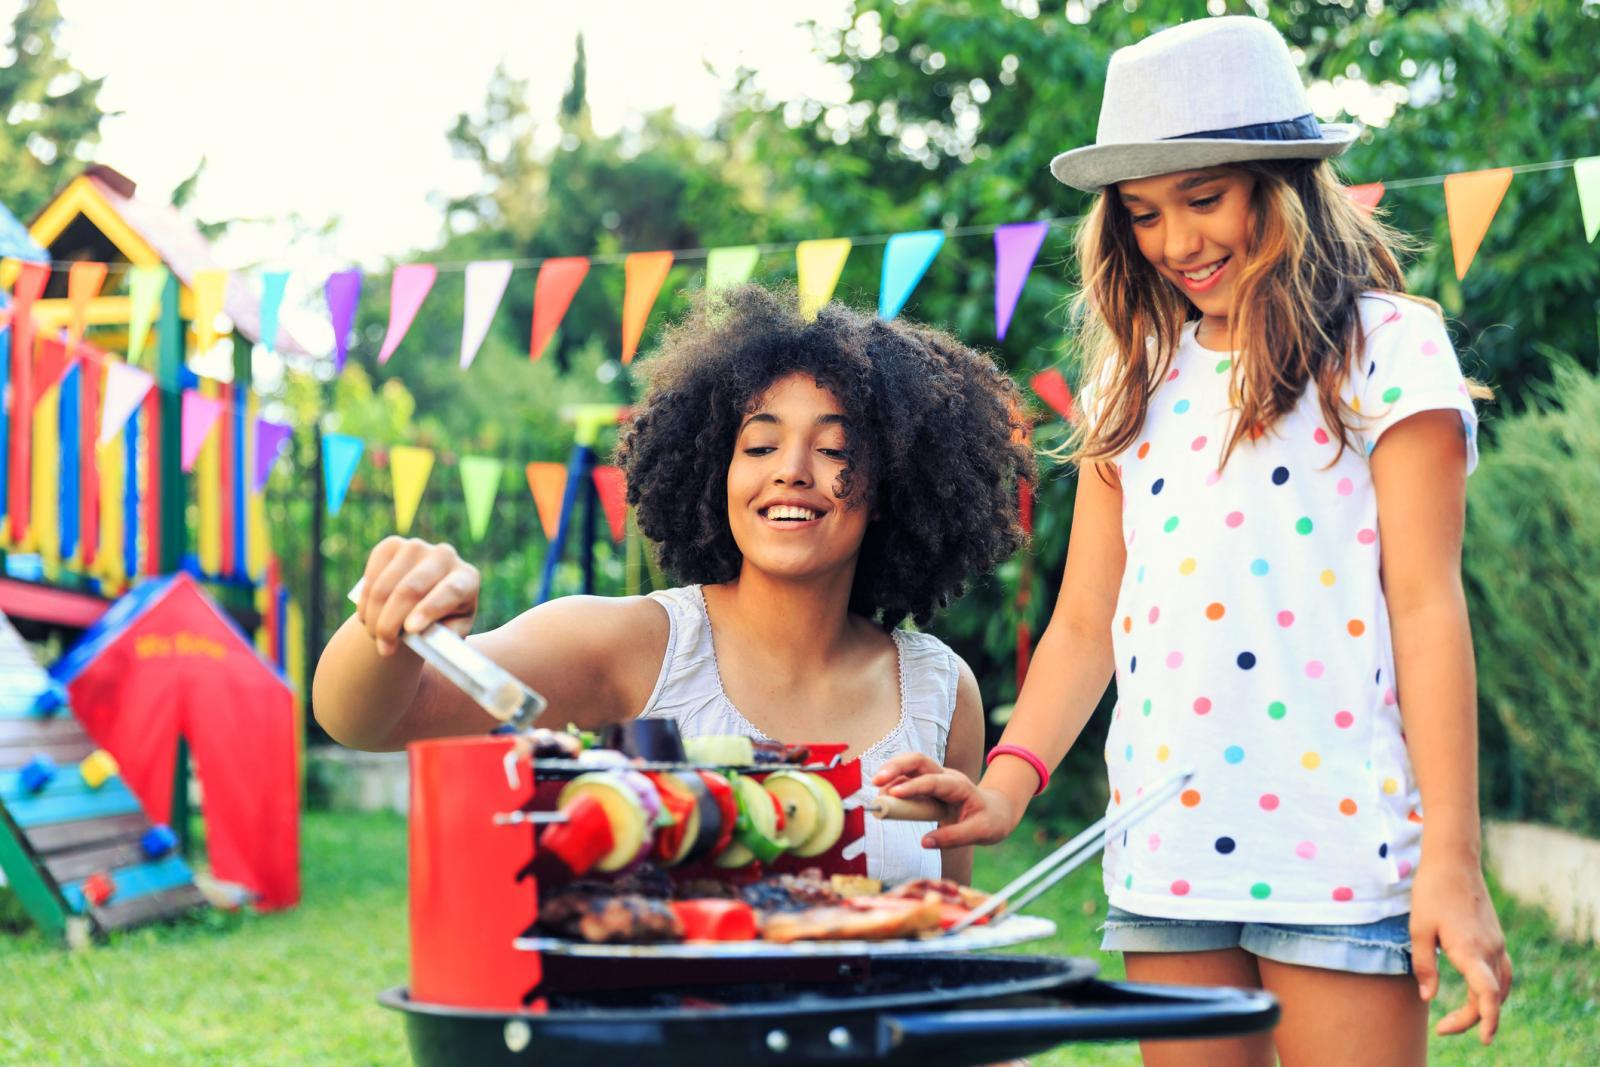 Mother and daughter having fun and preparing barbecue at backyard